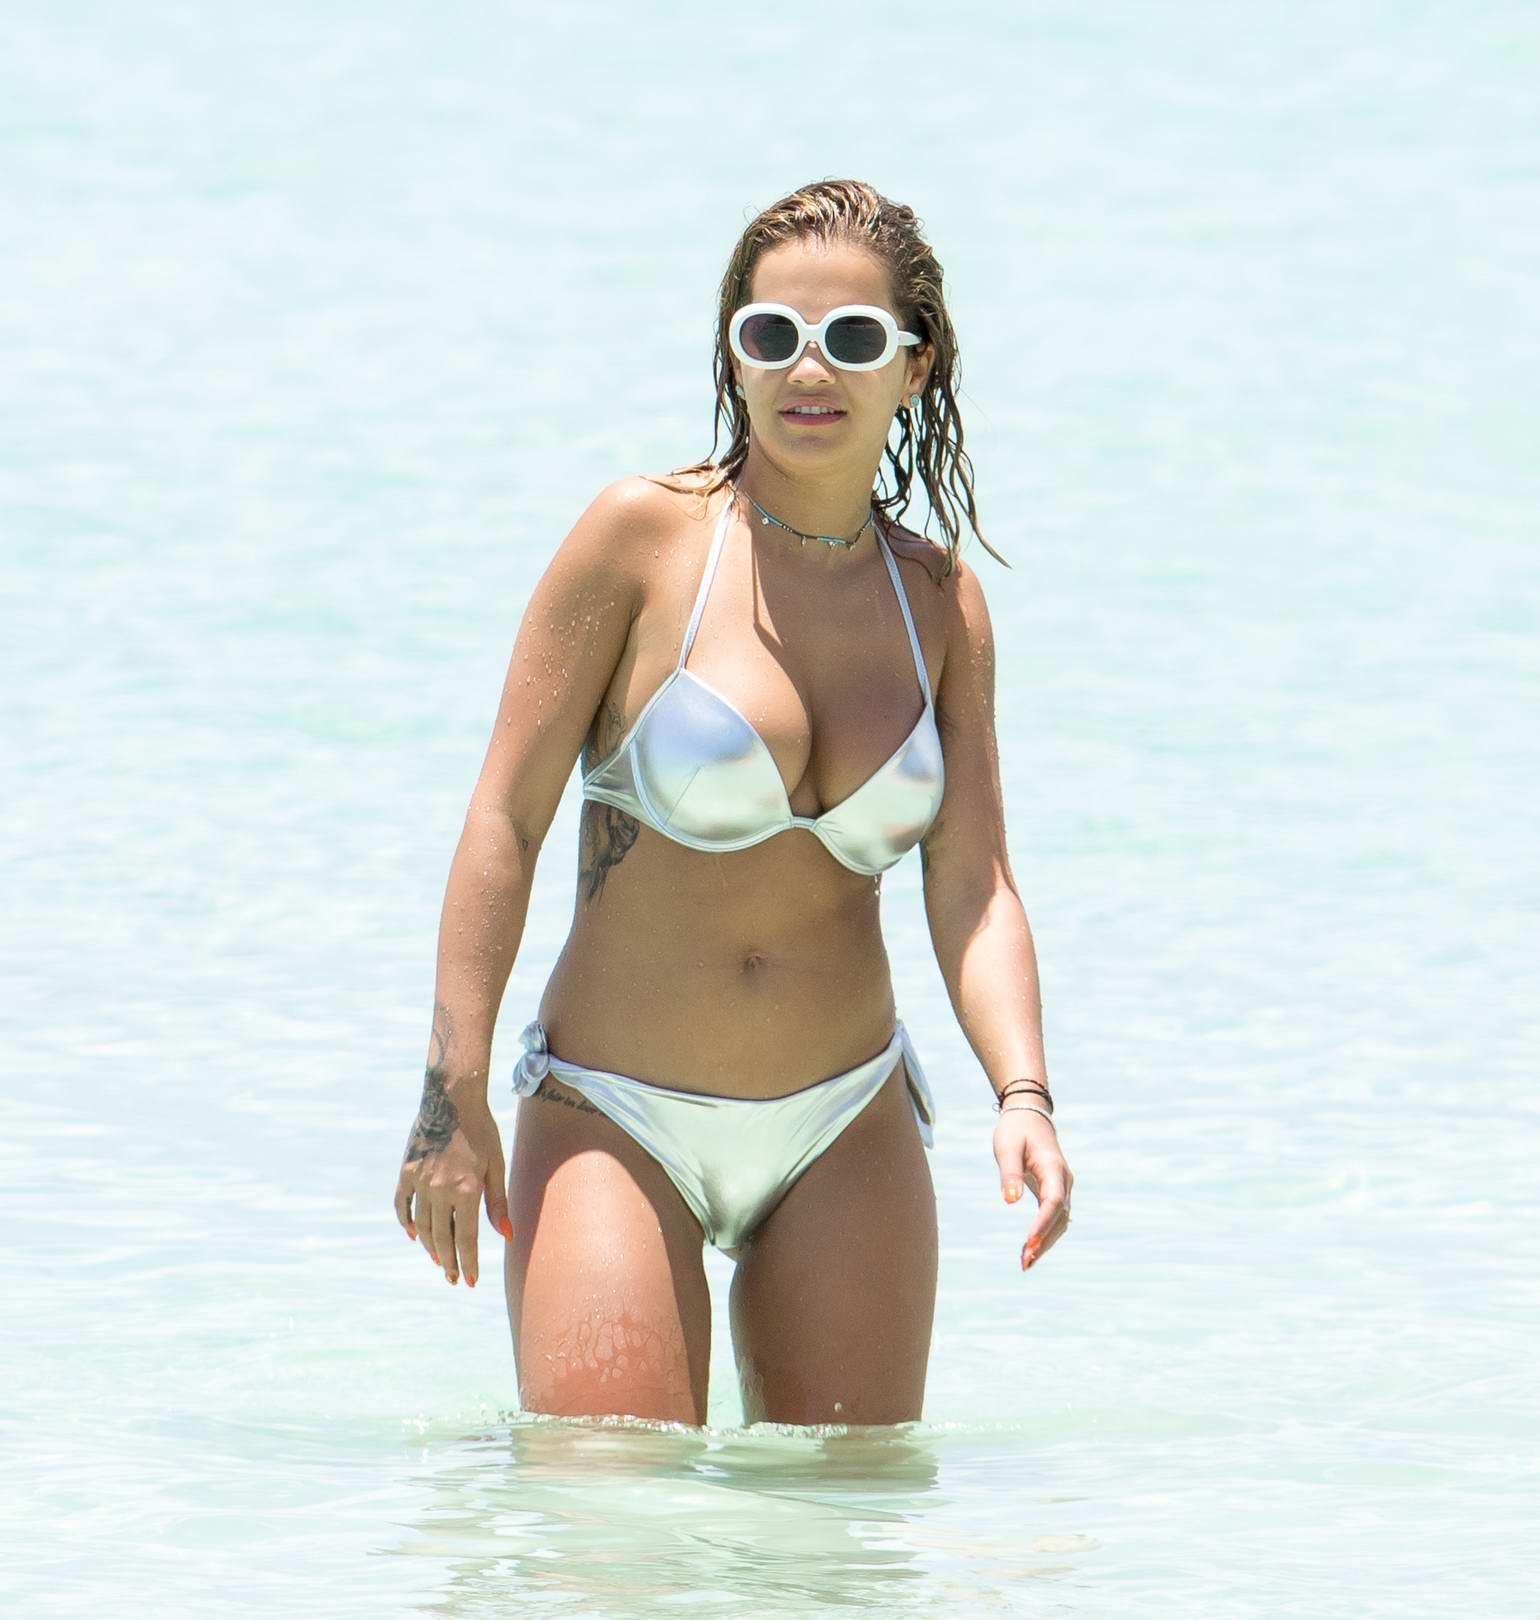 Rita Ora in a Silver Bikini at the Negril Seven Mile Beach with Friends in Jamaica